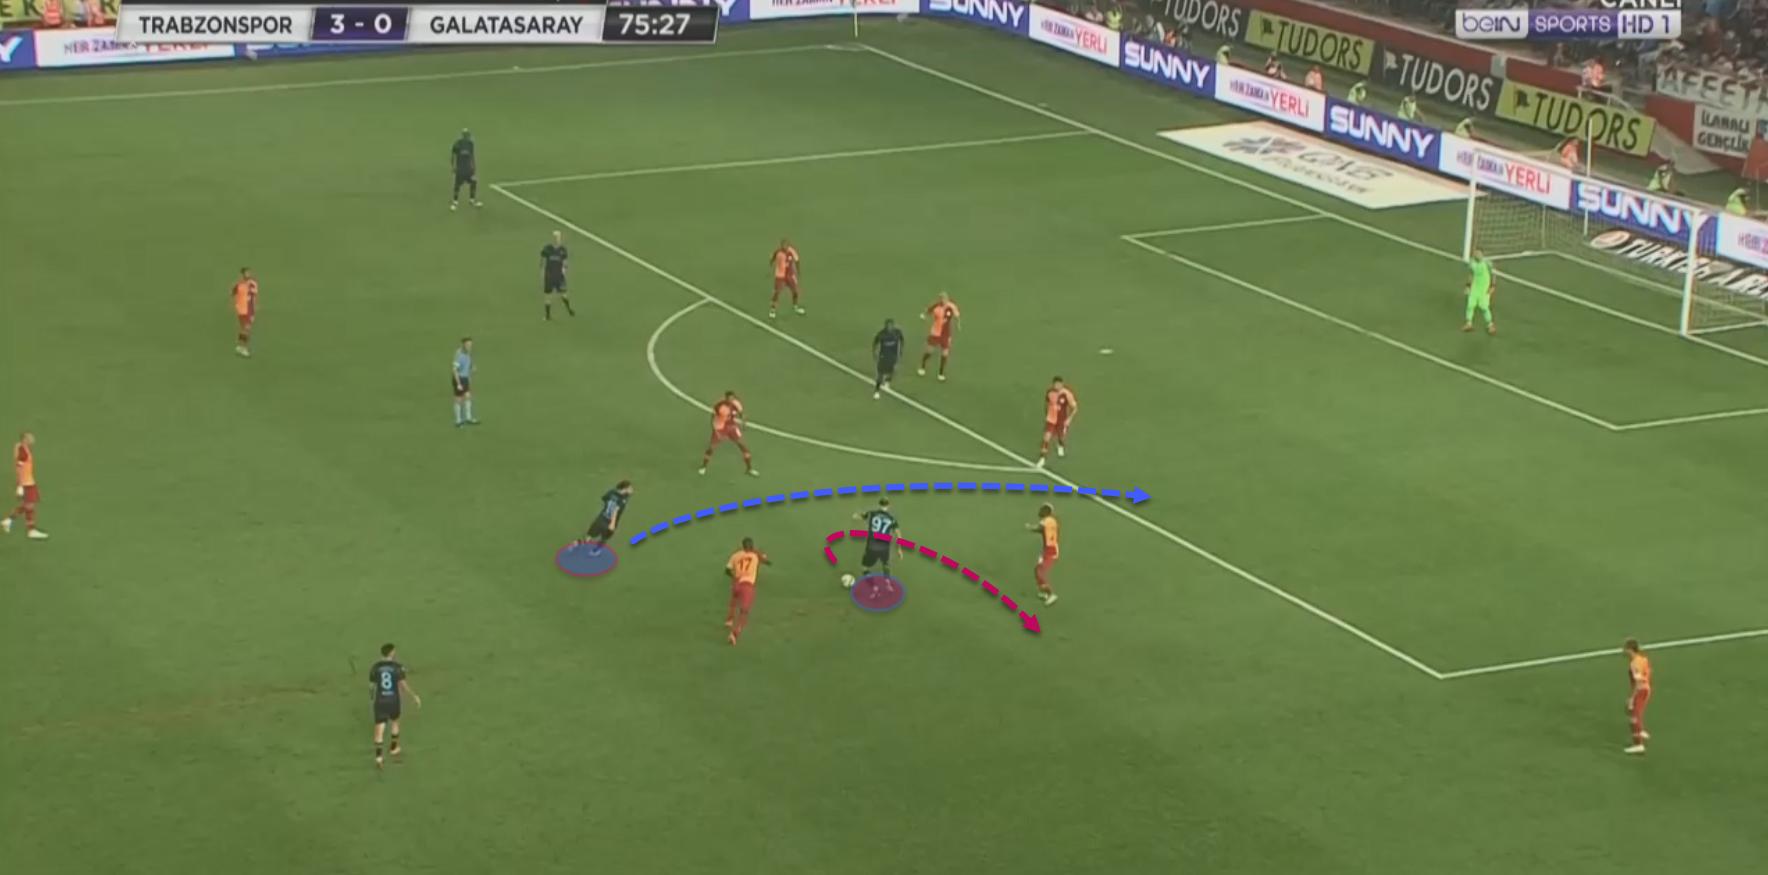 Yusuf Yazici 2018/19 - scout report - tactical analysis tactics